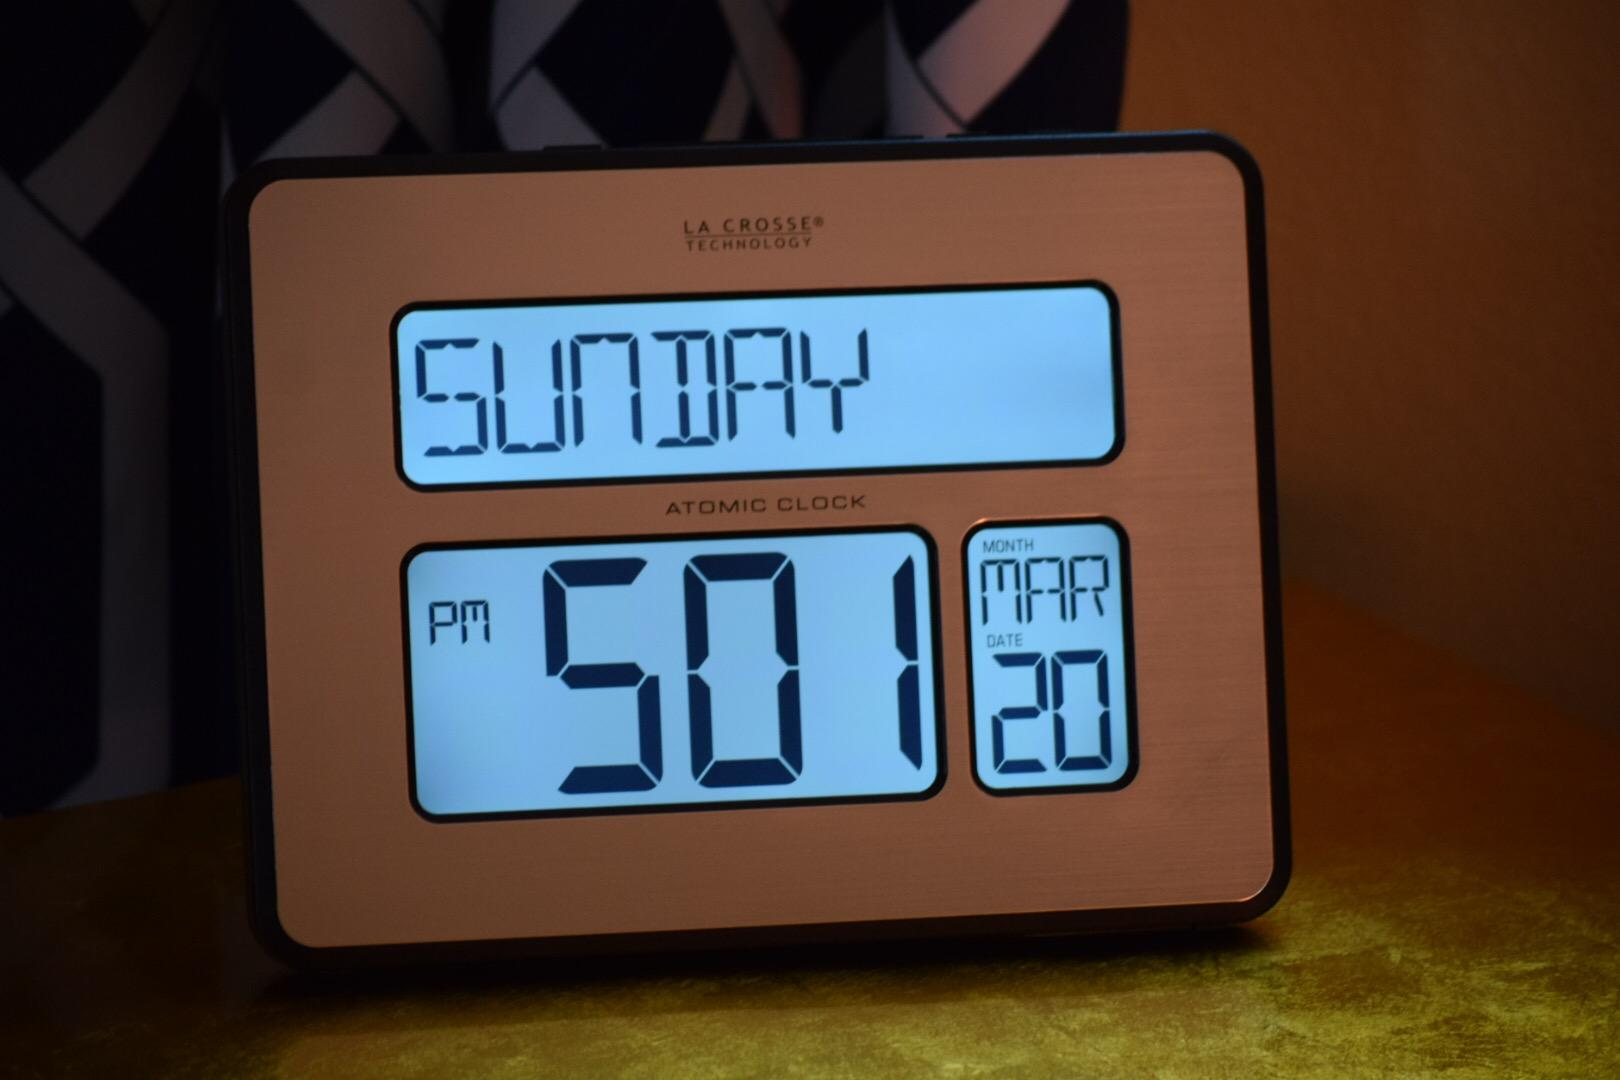 Digital Atomic Clock : Amazon la crosse technology bl int backlight